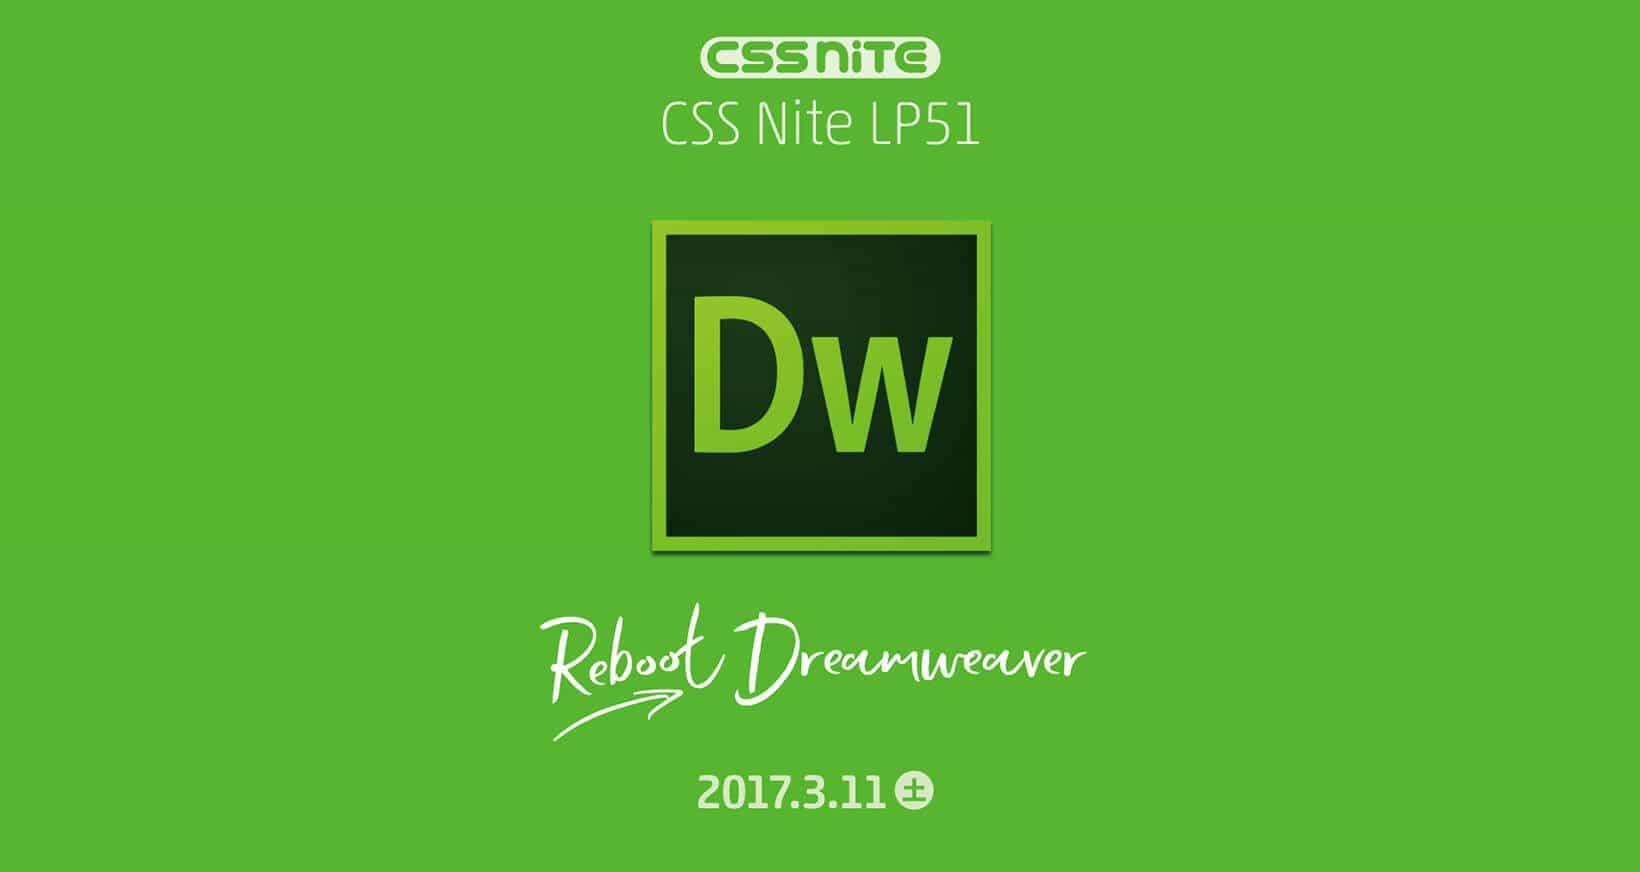 CSS Nite LP51「Reboot Dreamweaver」(2017年3月11日開催) 感想